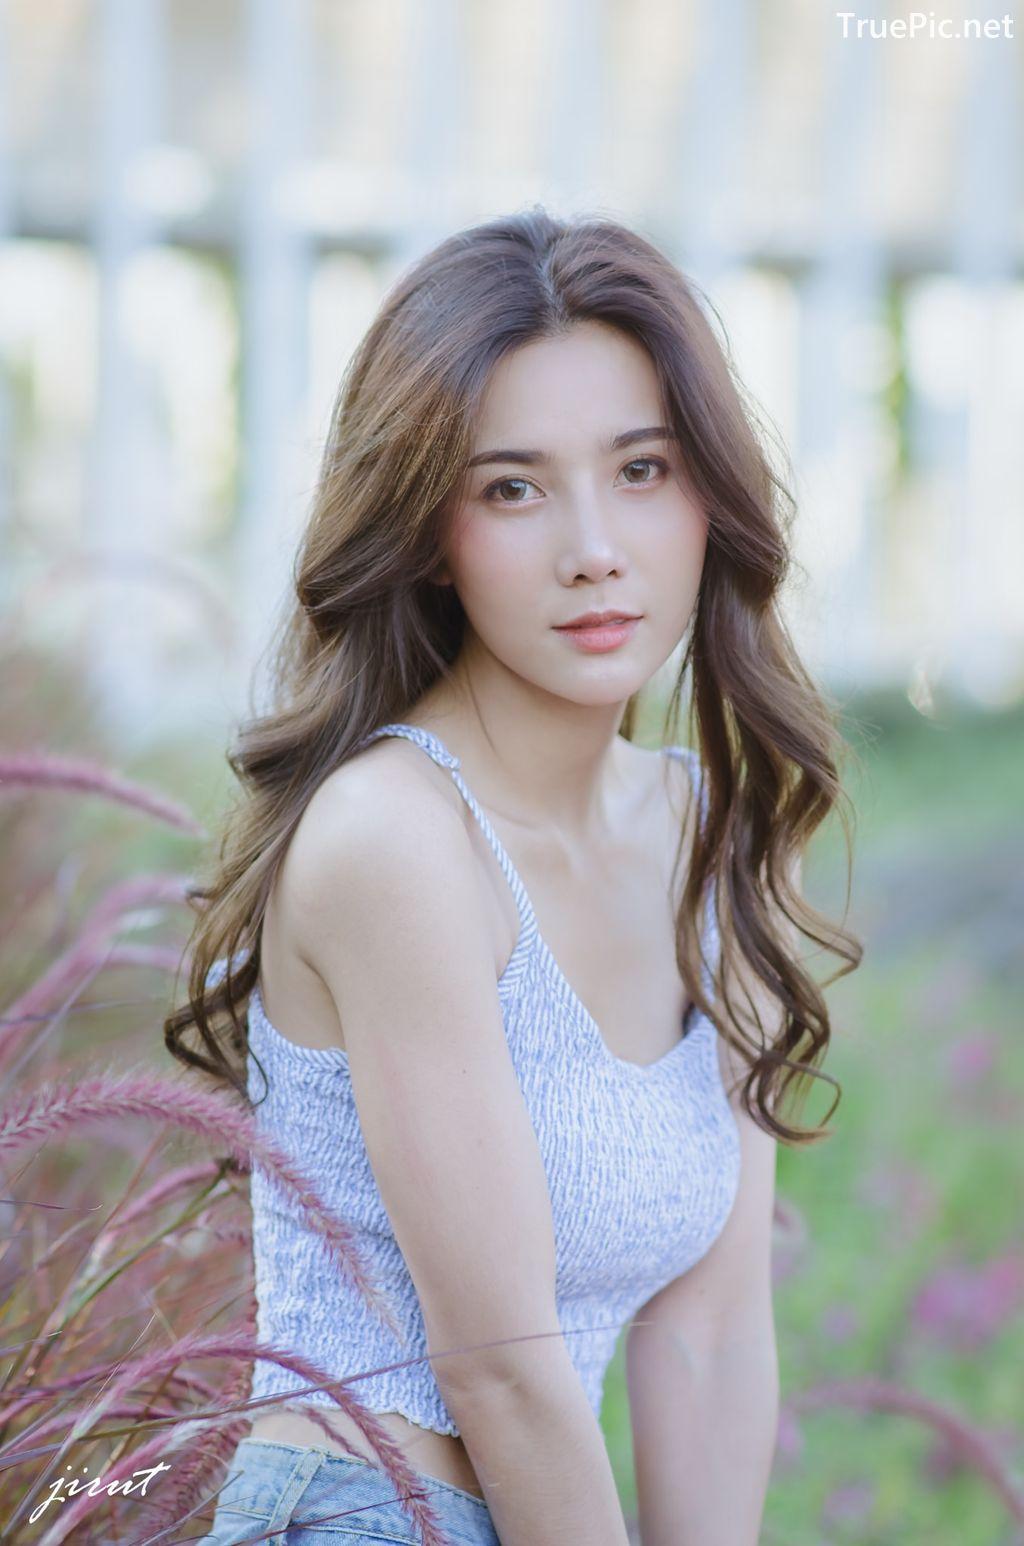 Image-Thailand-Model-Baiyok-Panachon-Cute-White-Crop-Top-and-Short-Jean-TruePic.net- Picture-8